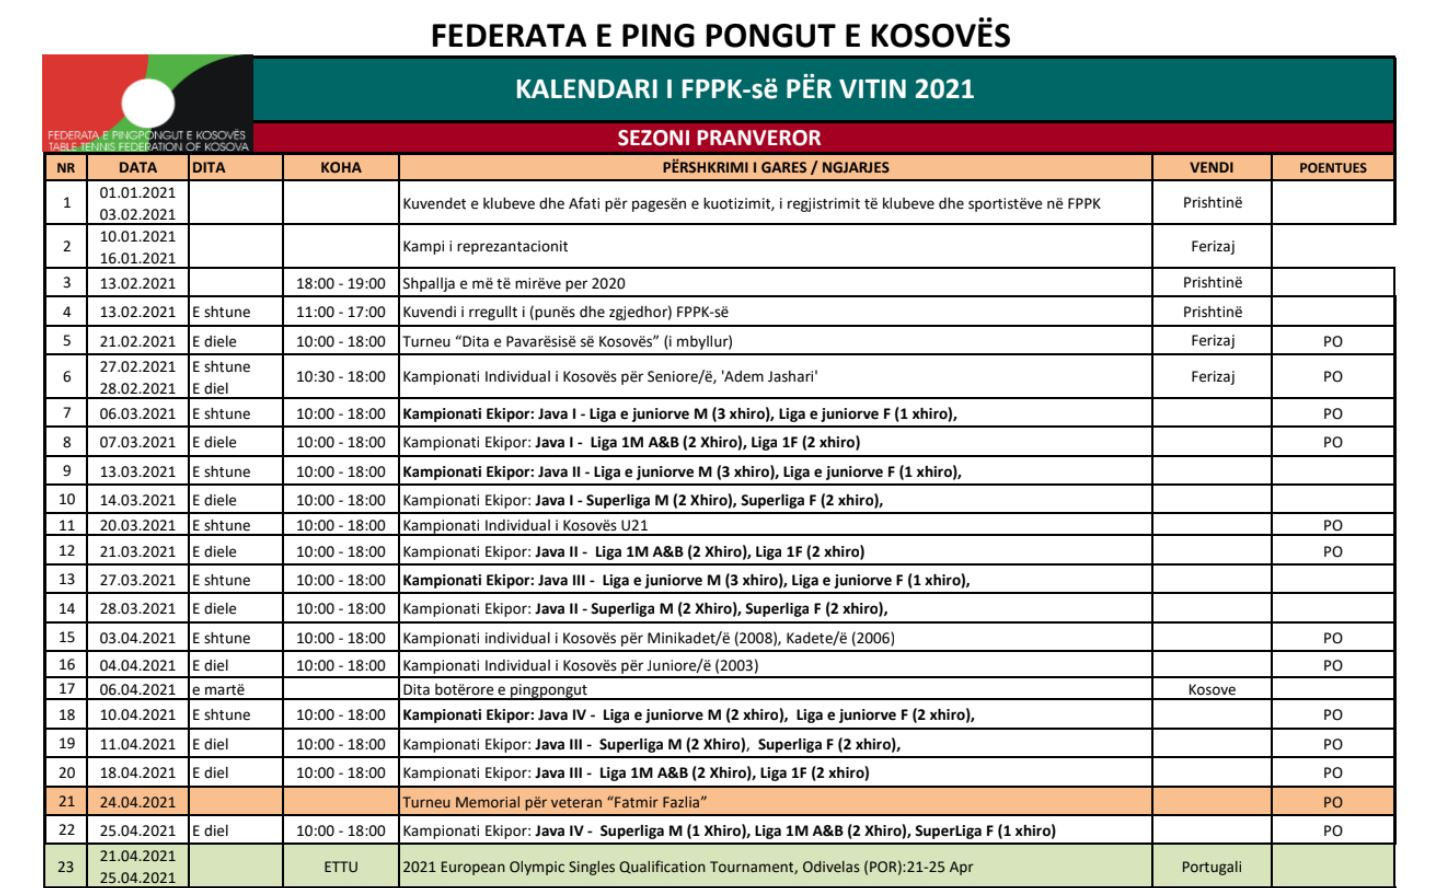 Publikohet kalendari i garave 2021